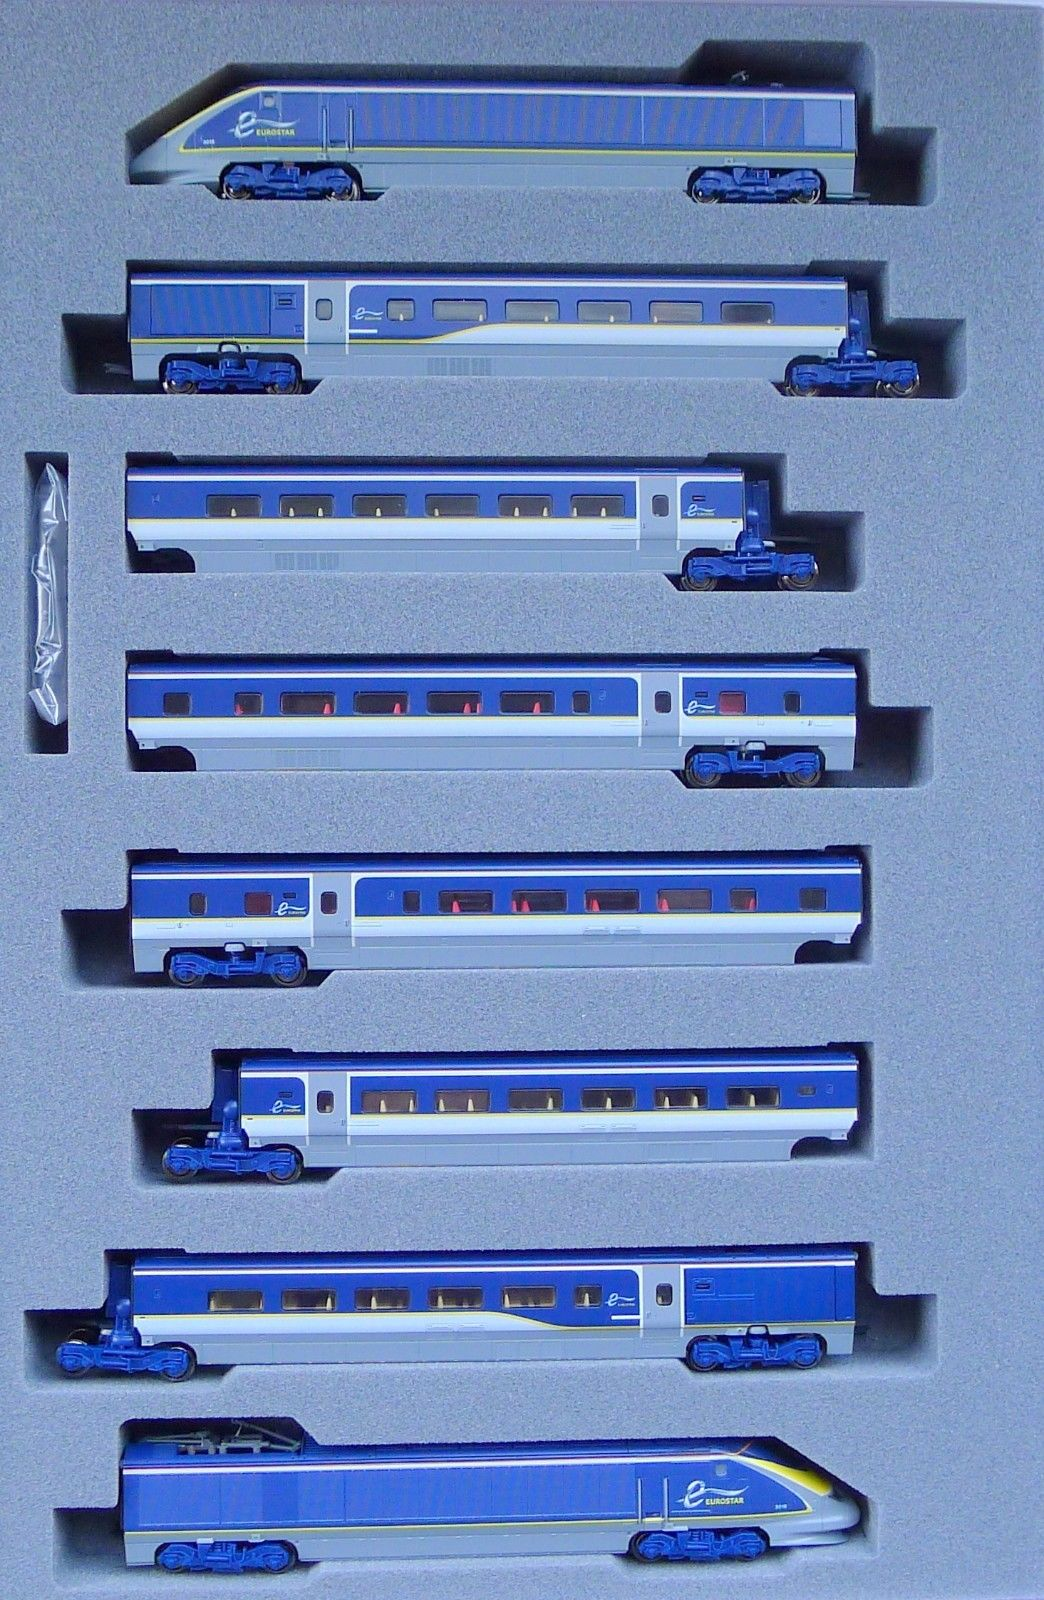 N Scale - Kato Lemke - 10-1297 - Passenger Train, Electric, TGV - Eurostar - 3015, 3016